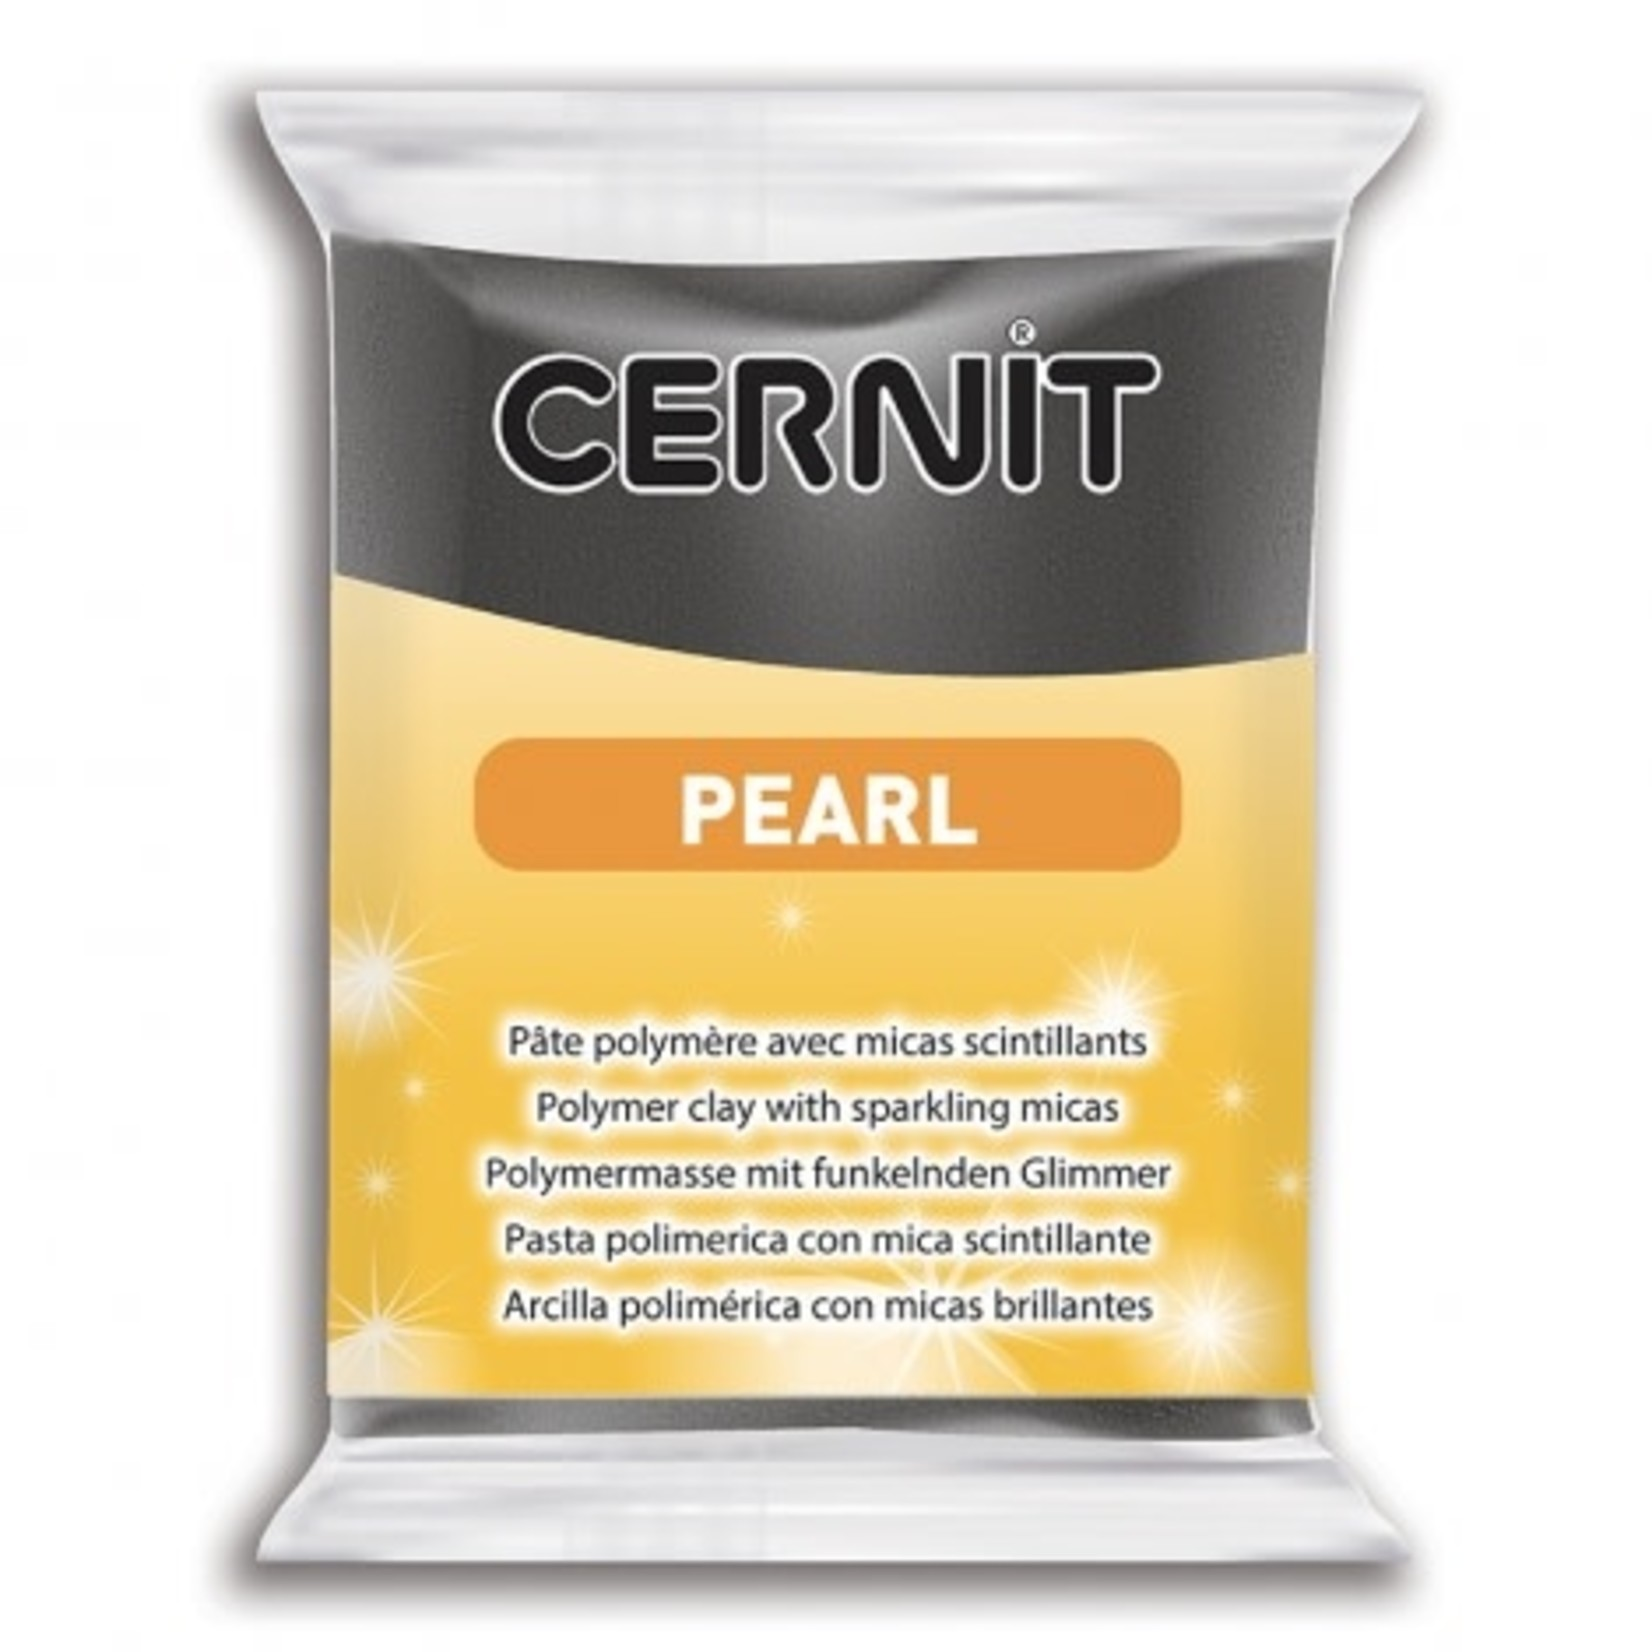 Cernit Cernit Pearl 56g Black